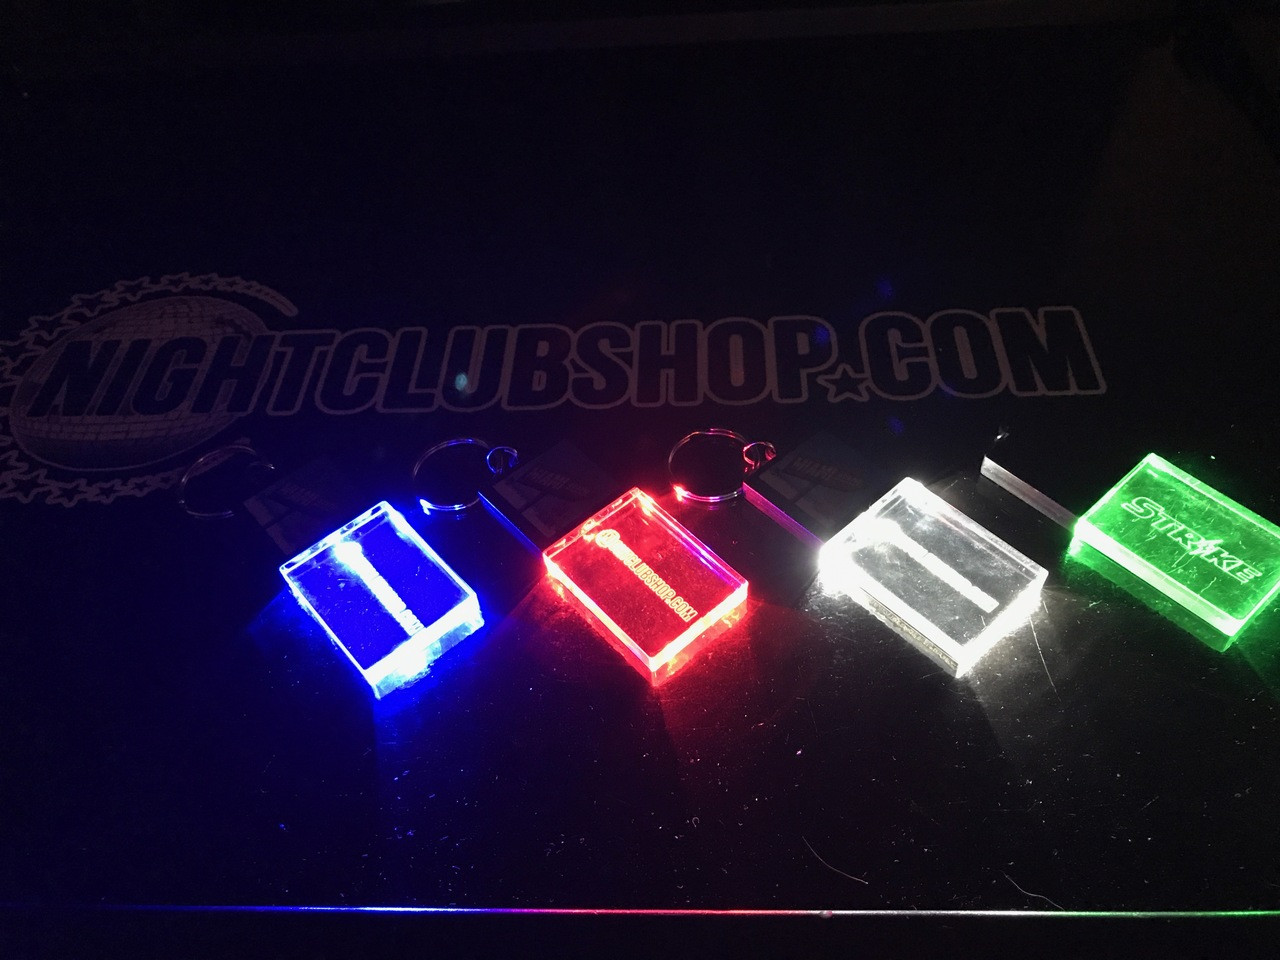 Light up,LED,Keychain,Key,chain,LED keychain, custom, BEAM, dual, print,engraved, logo,text, laser engraved,personalized,promo,merch,fundraiser,nightclub,fund raiser, sponsor,charity, drive